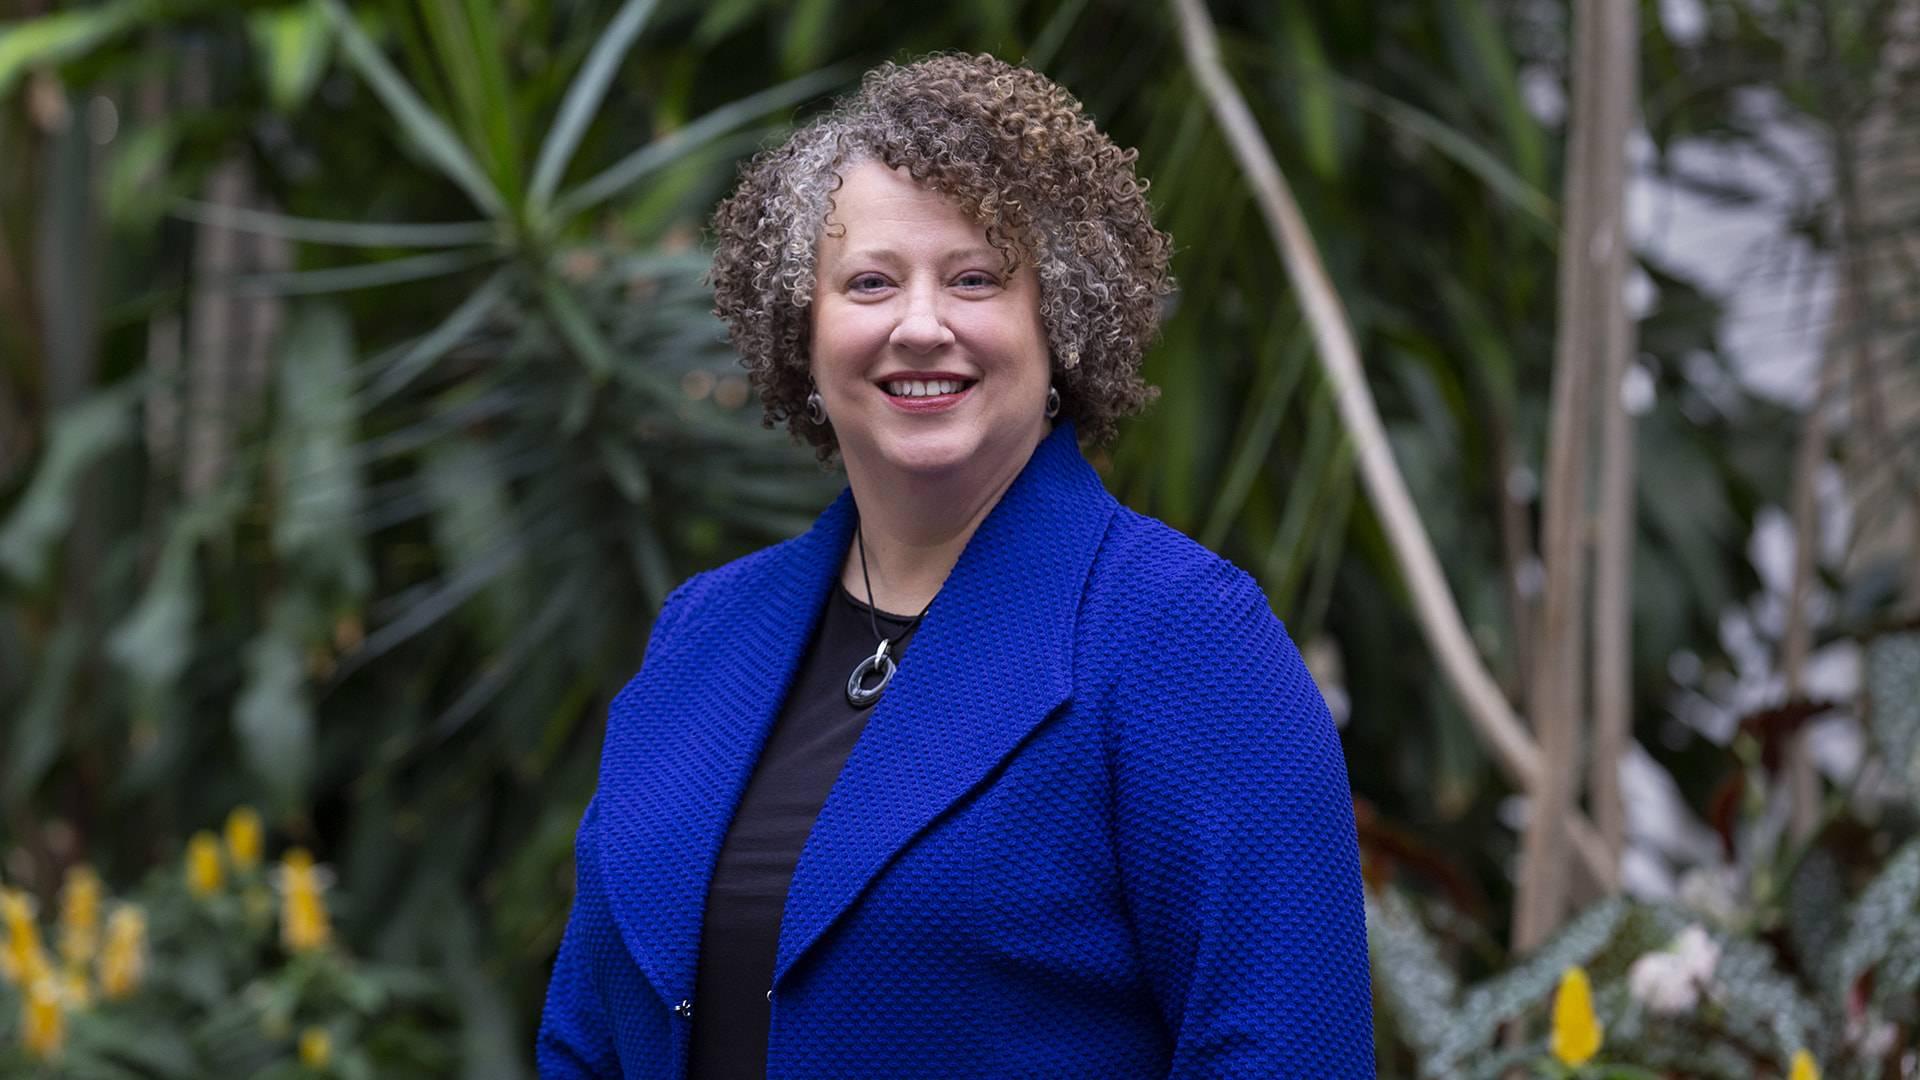 New director hopes to bridge gap between UHCL alumni, students